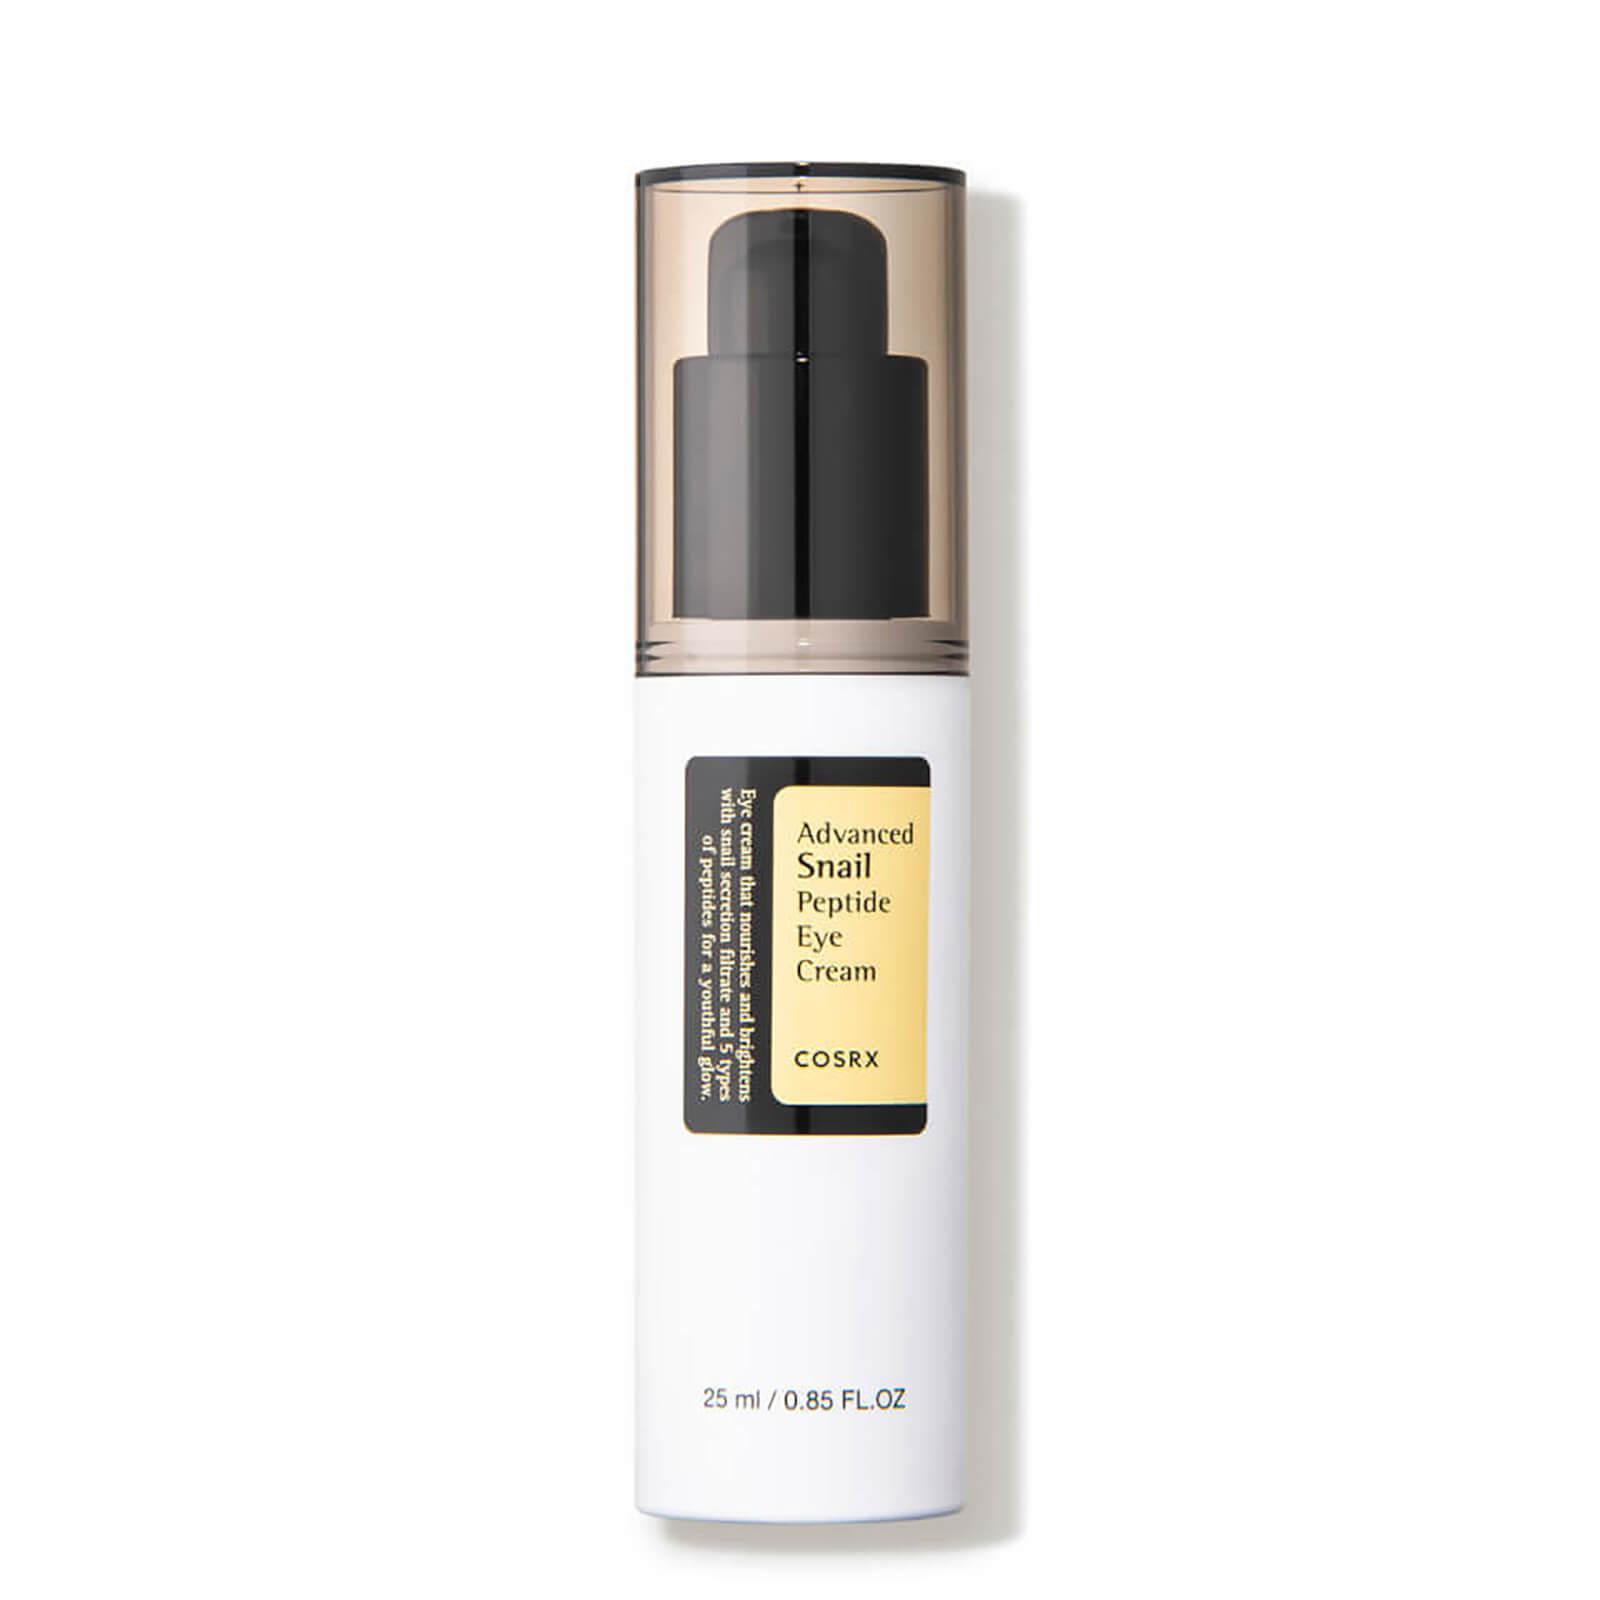 Купить COSRX Advanced Snail Peptide Eye Cream 25ml